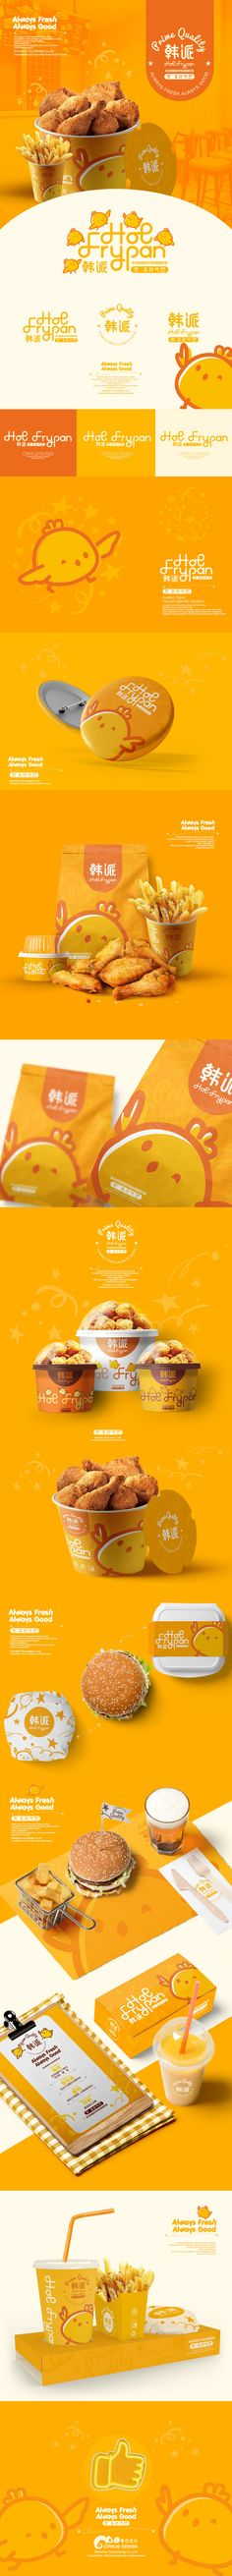 Ознакомьтесь с этим проектом @Behance: «HotFrypan Fastfood Brand!Fried chicken from Korea» https://www.behance.net/gallery/49603977/HotFrypan-Fastfood-BrandFried-chicken-from-Korea